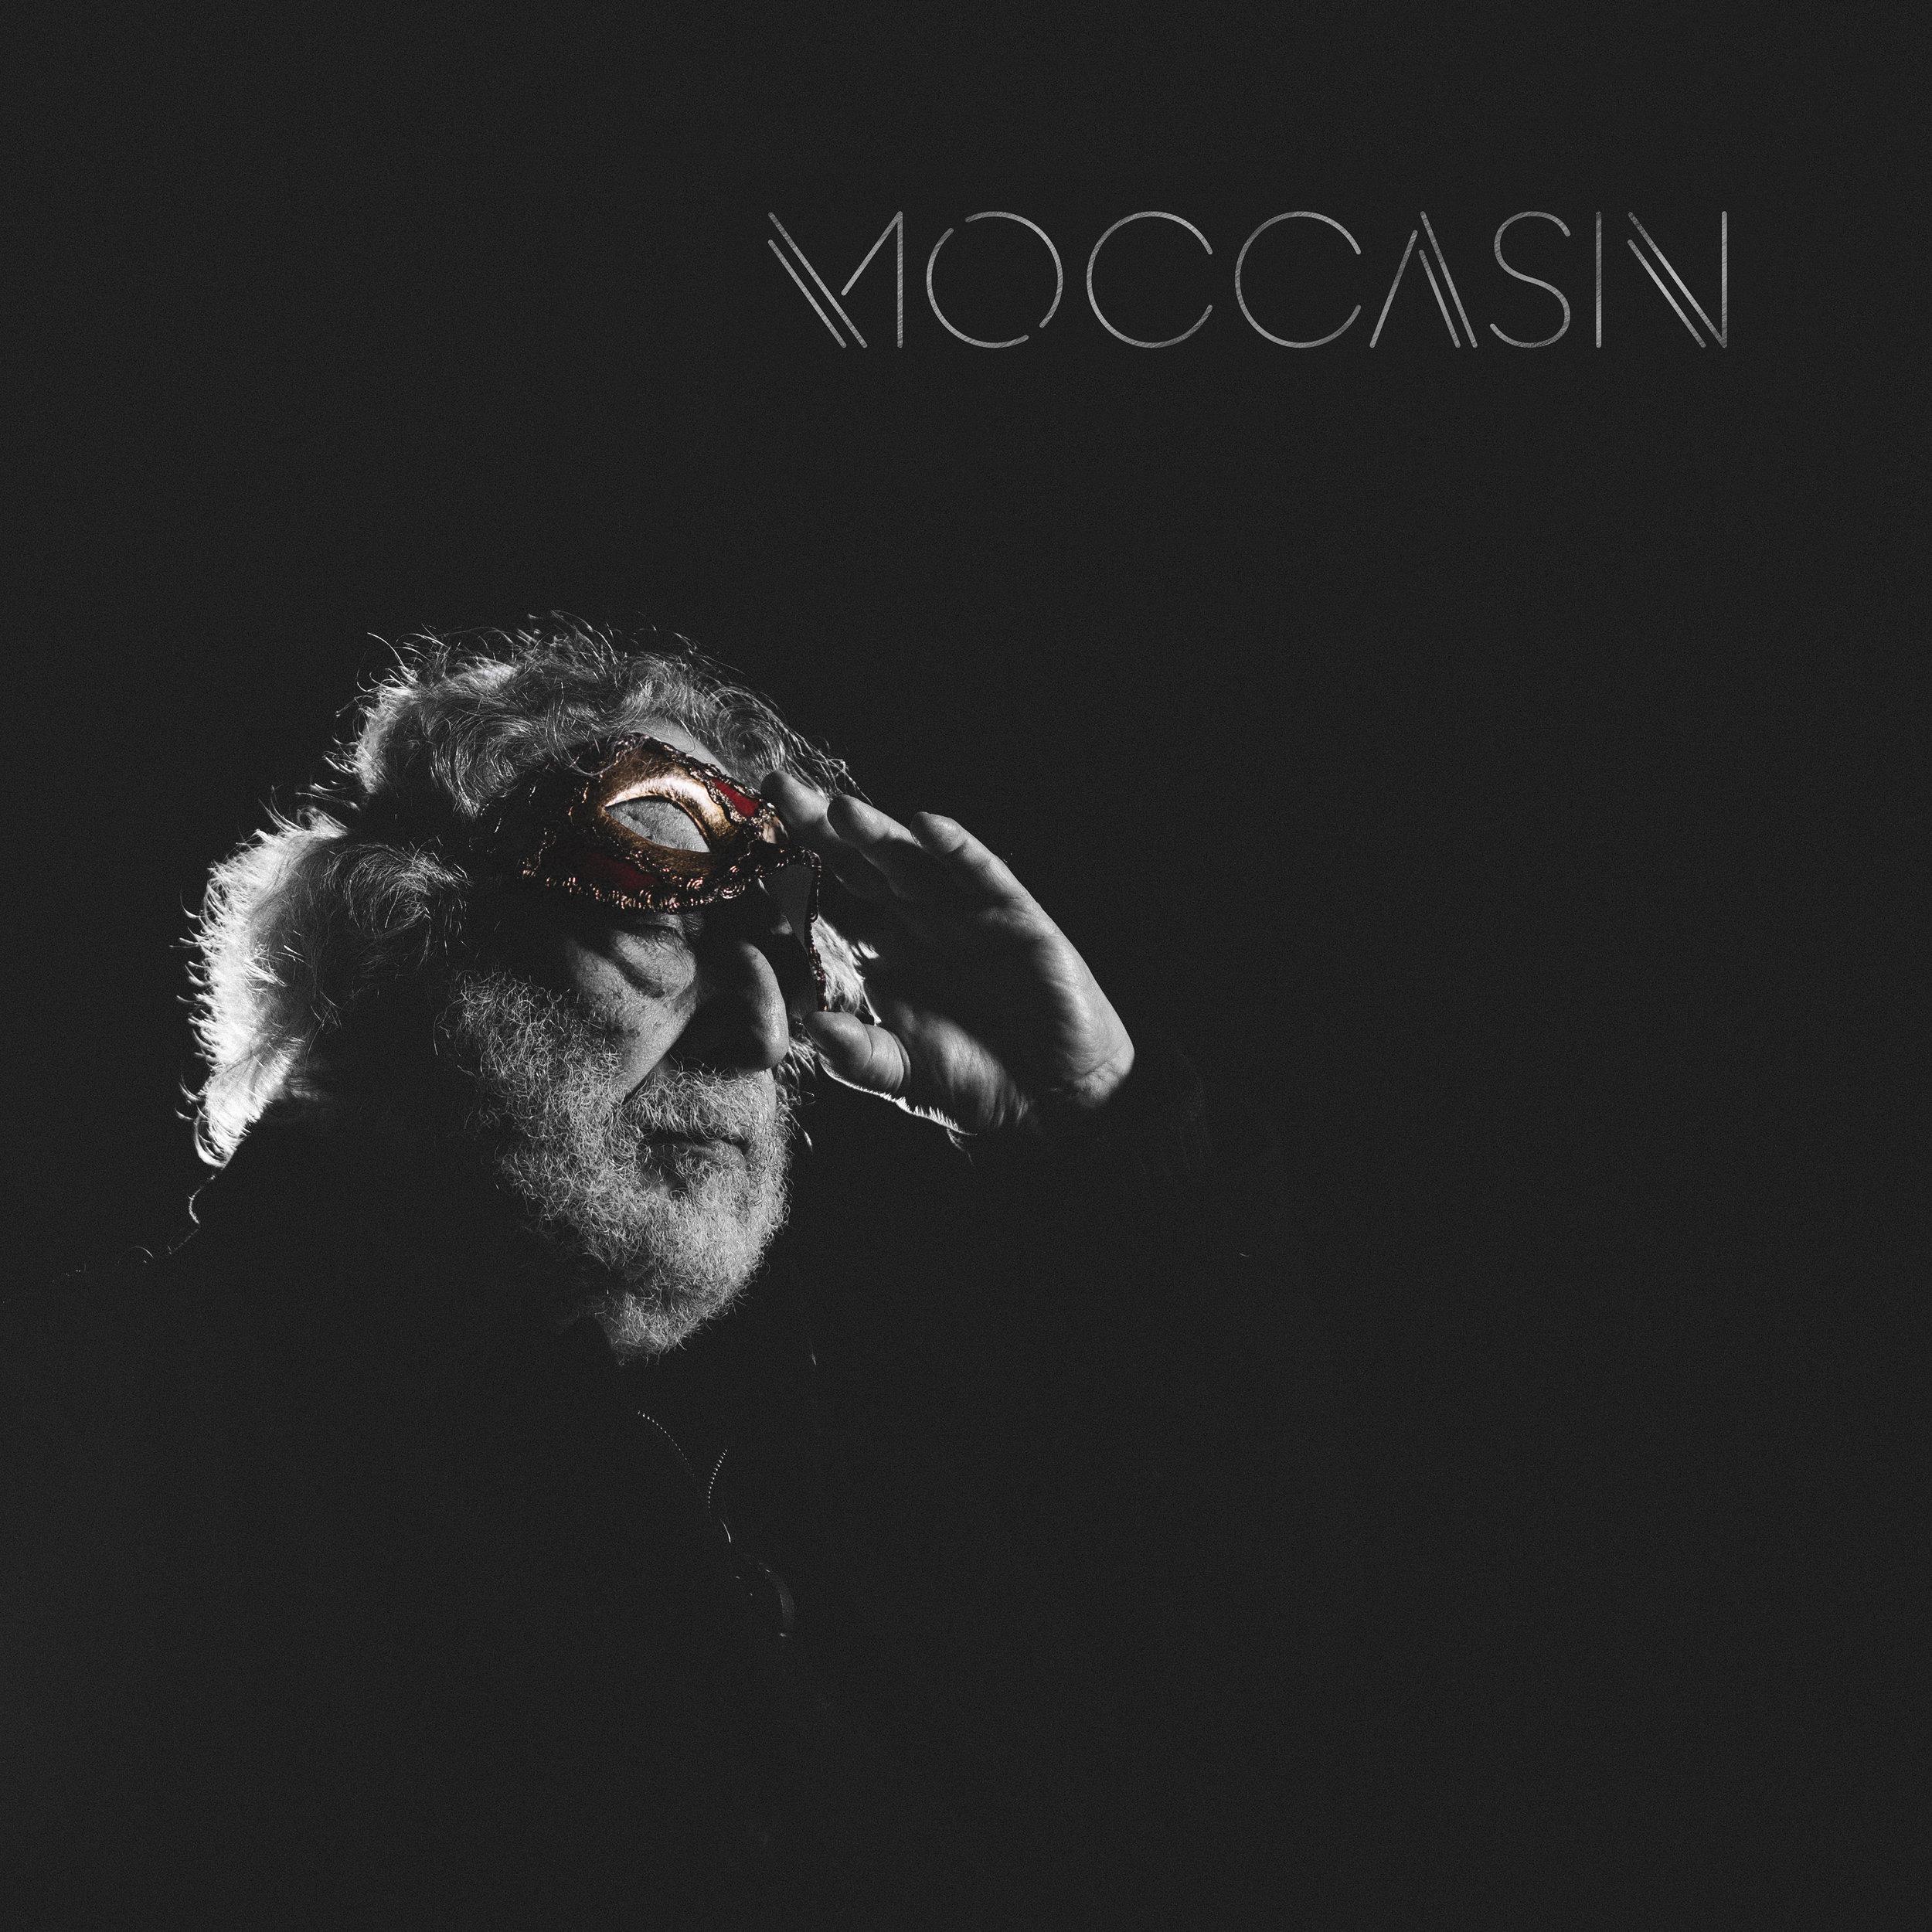 moccasin-masquerade.jpg